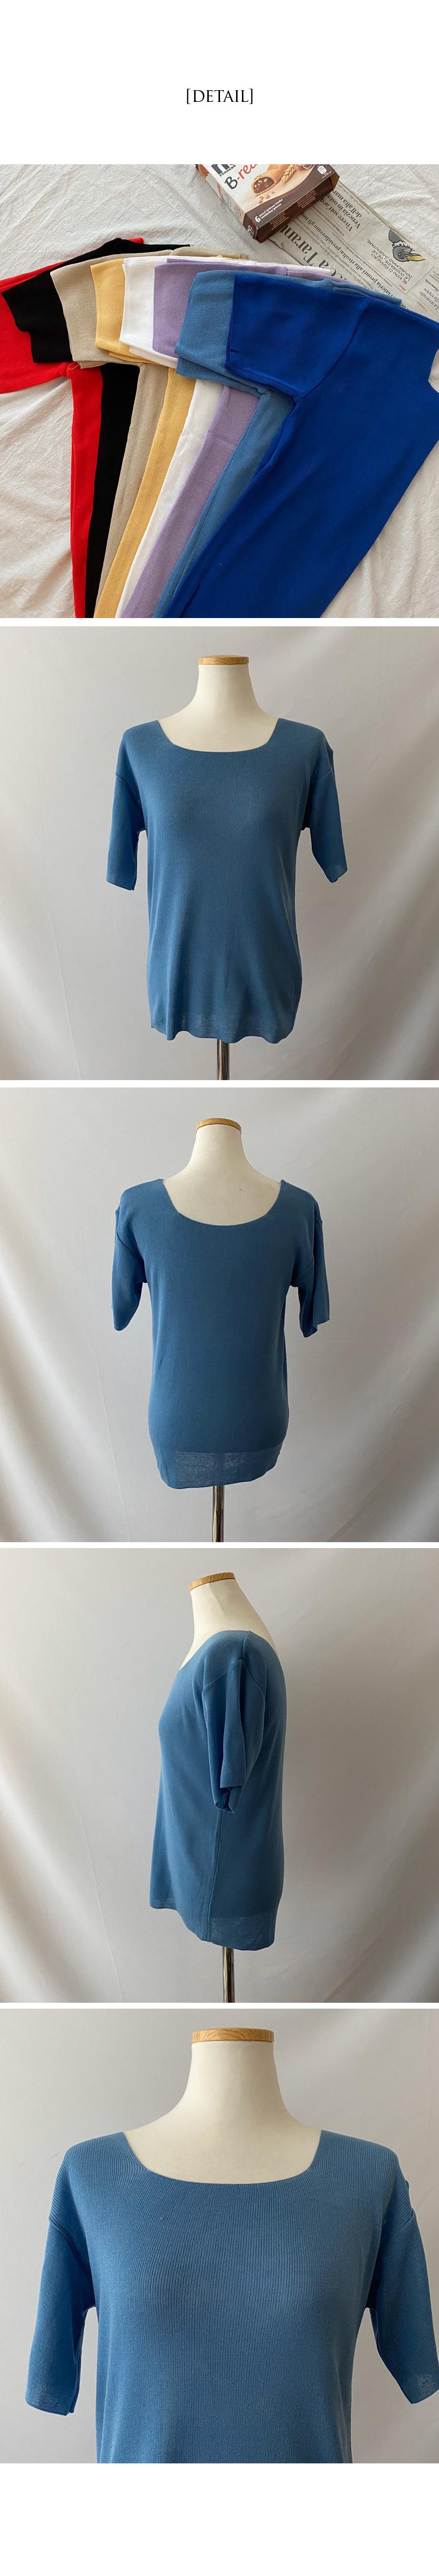 Bobo square neck edge knit